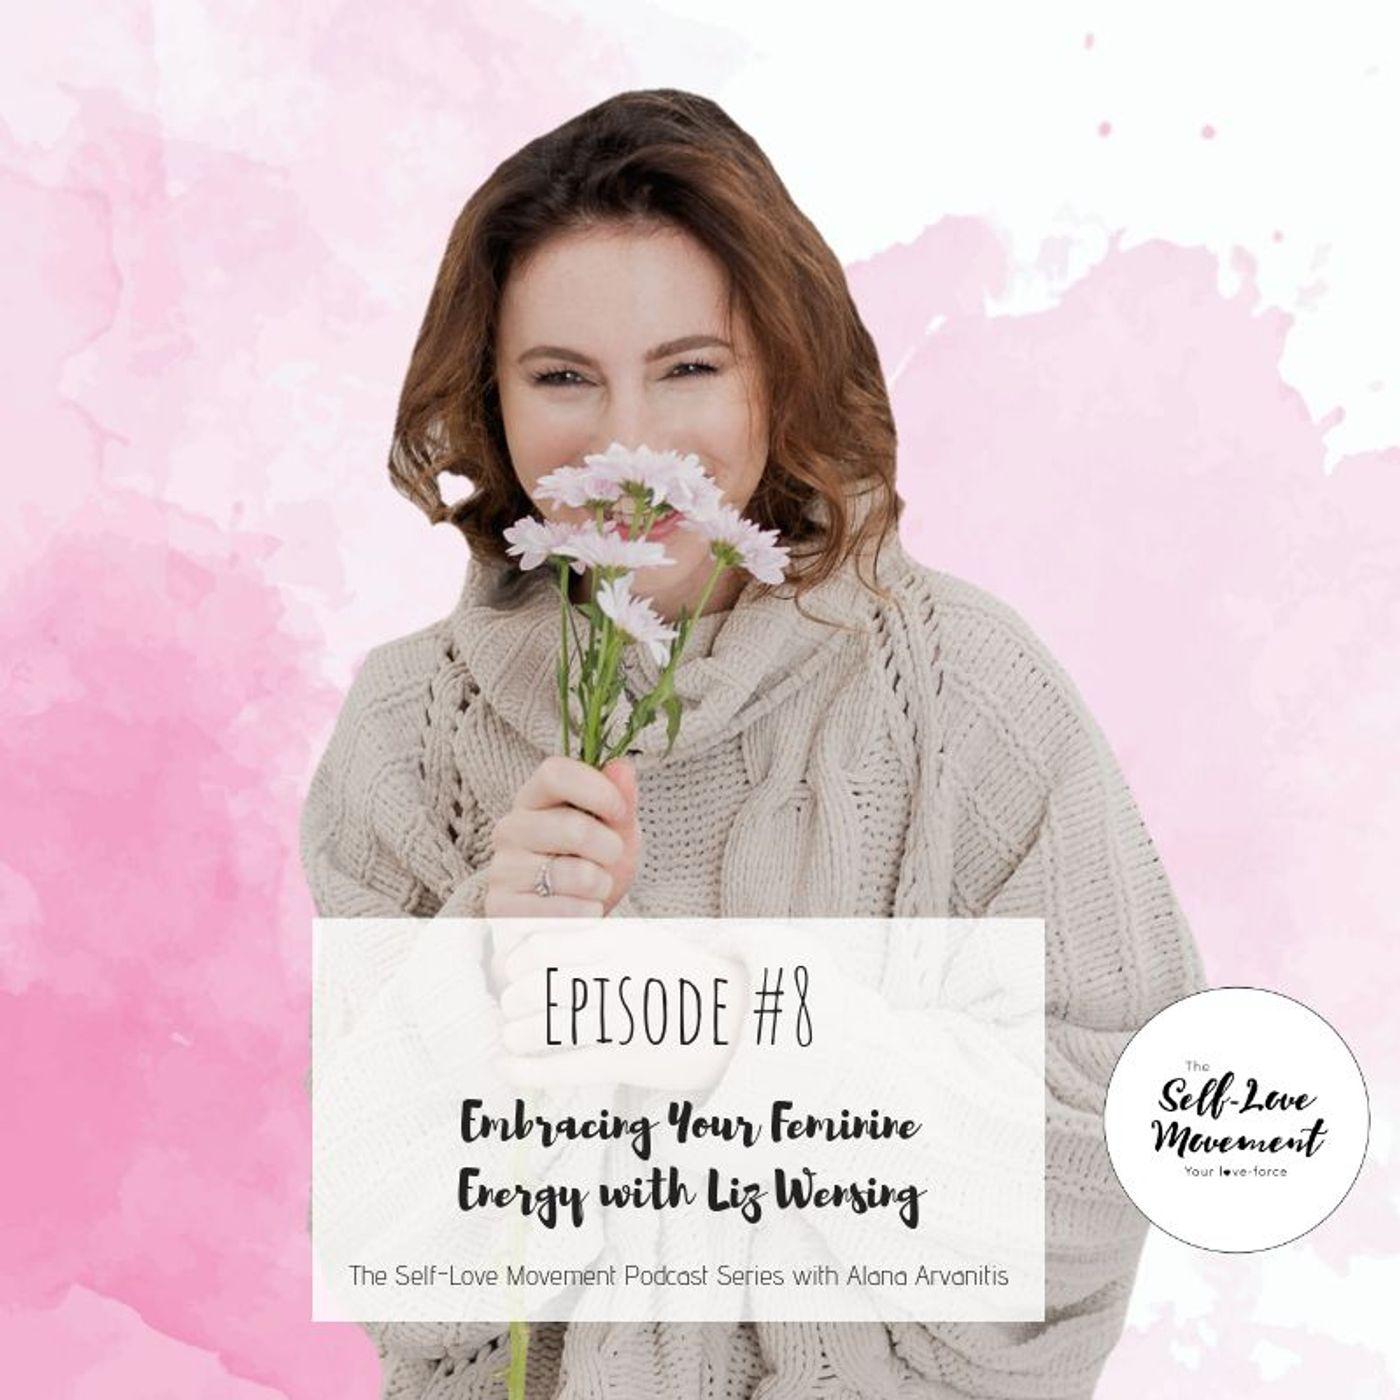 Episode #8 Embracing Your Feminine Energy With Liz Wensing